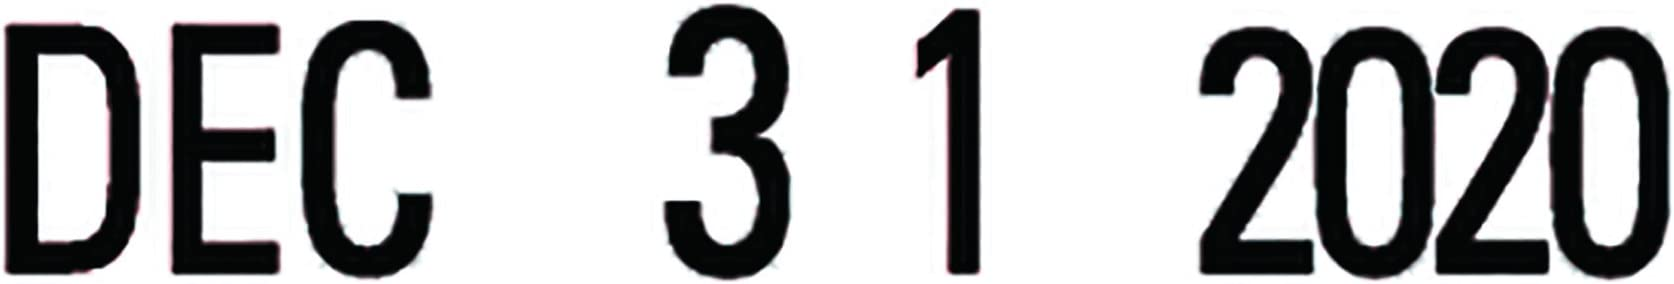 Message Dater Black 1 x 5//32 Pre-Inked Xstamper 52112 VersaDater Line Dater